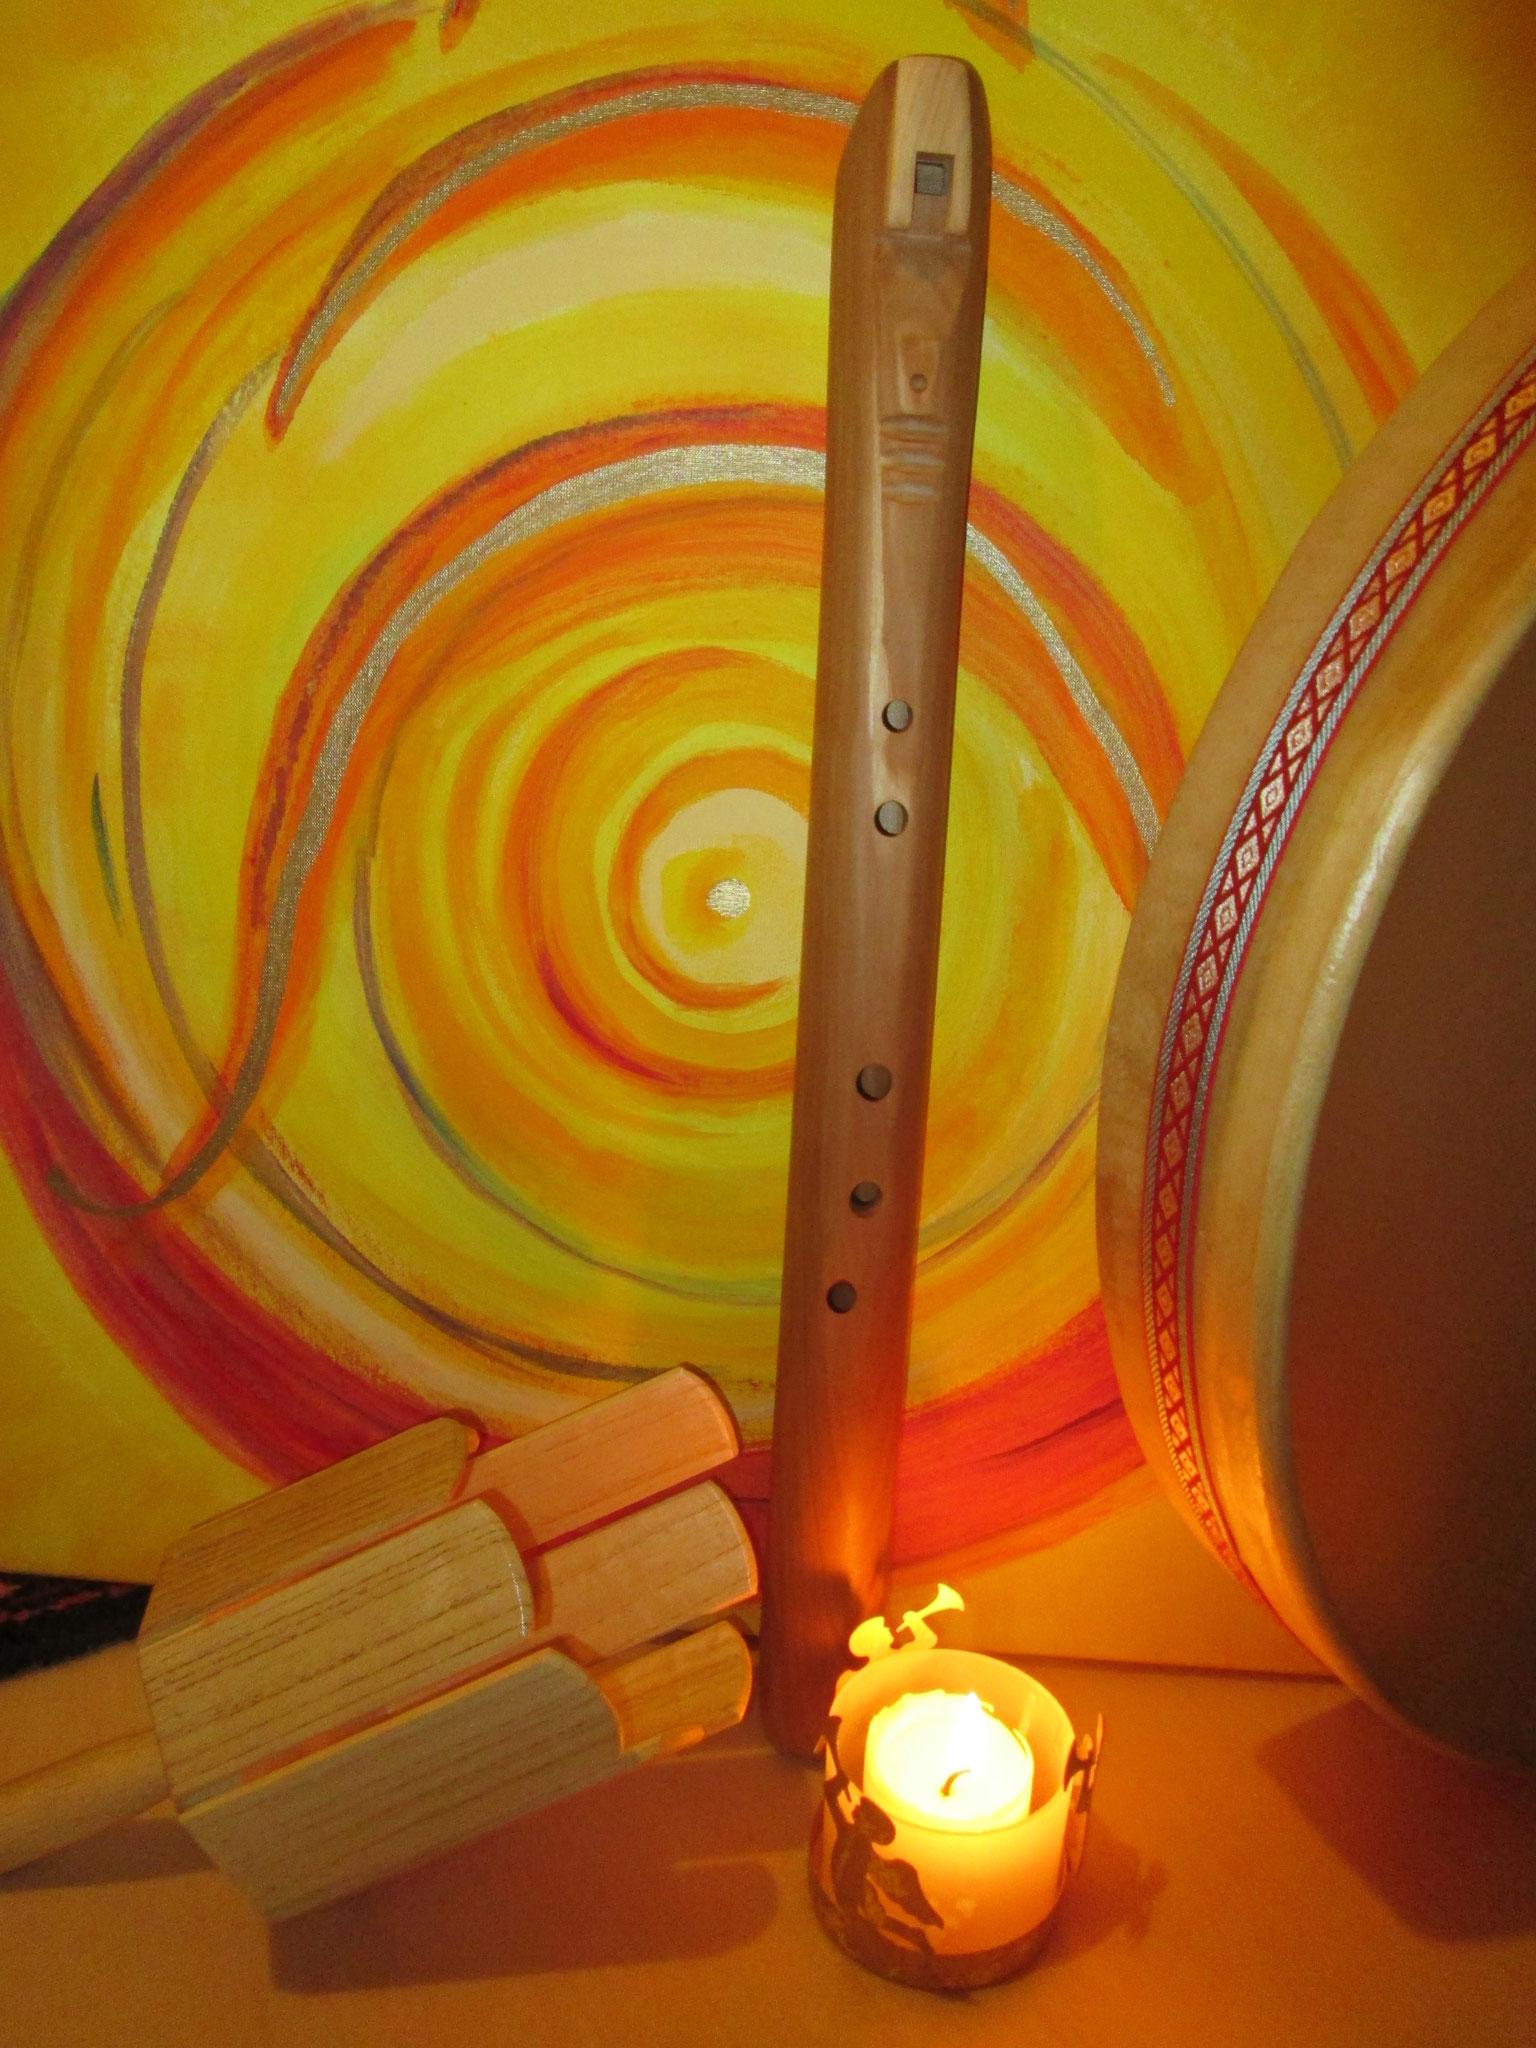 Erdklangflöte, Rührtrommel, Ocean Drum